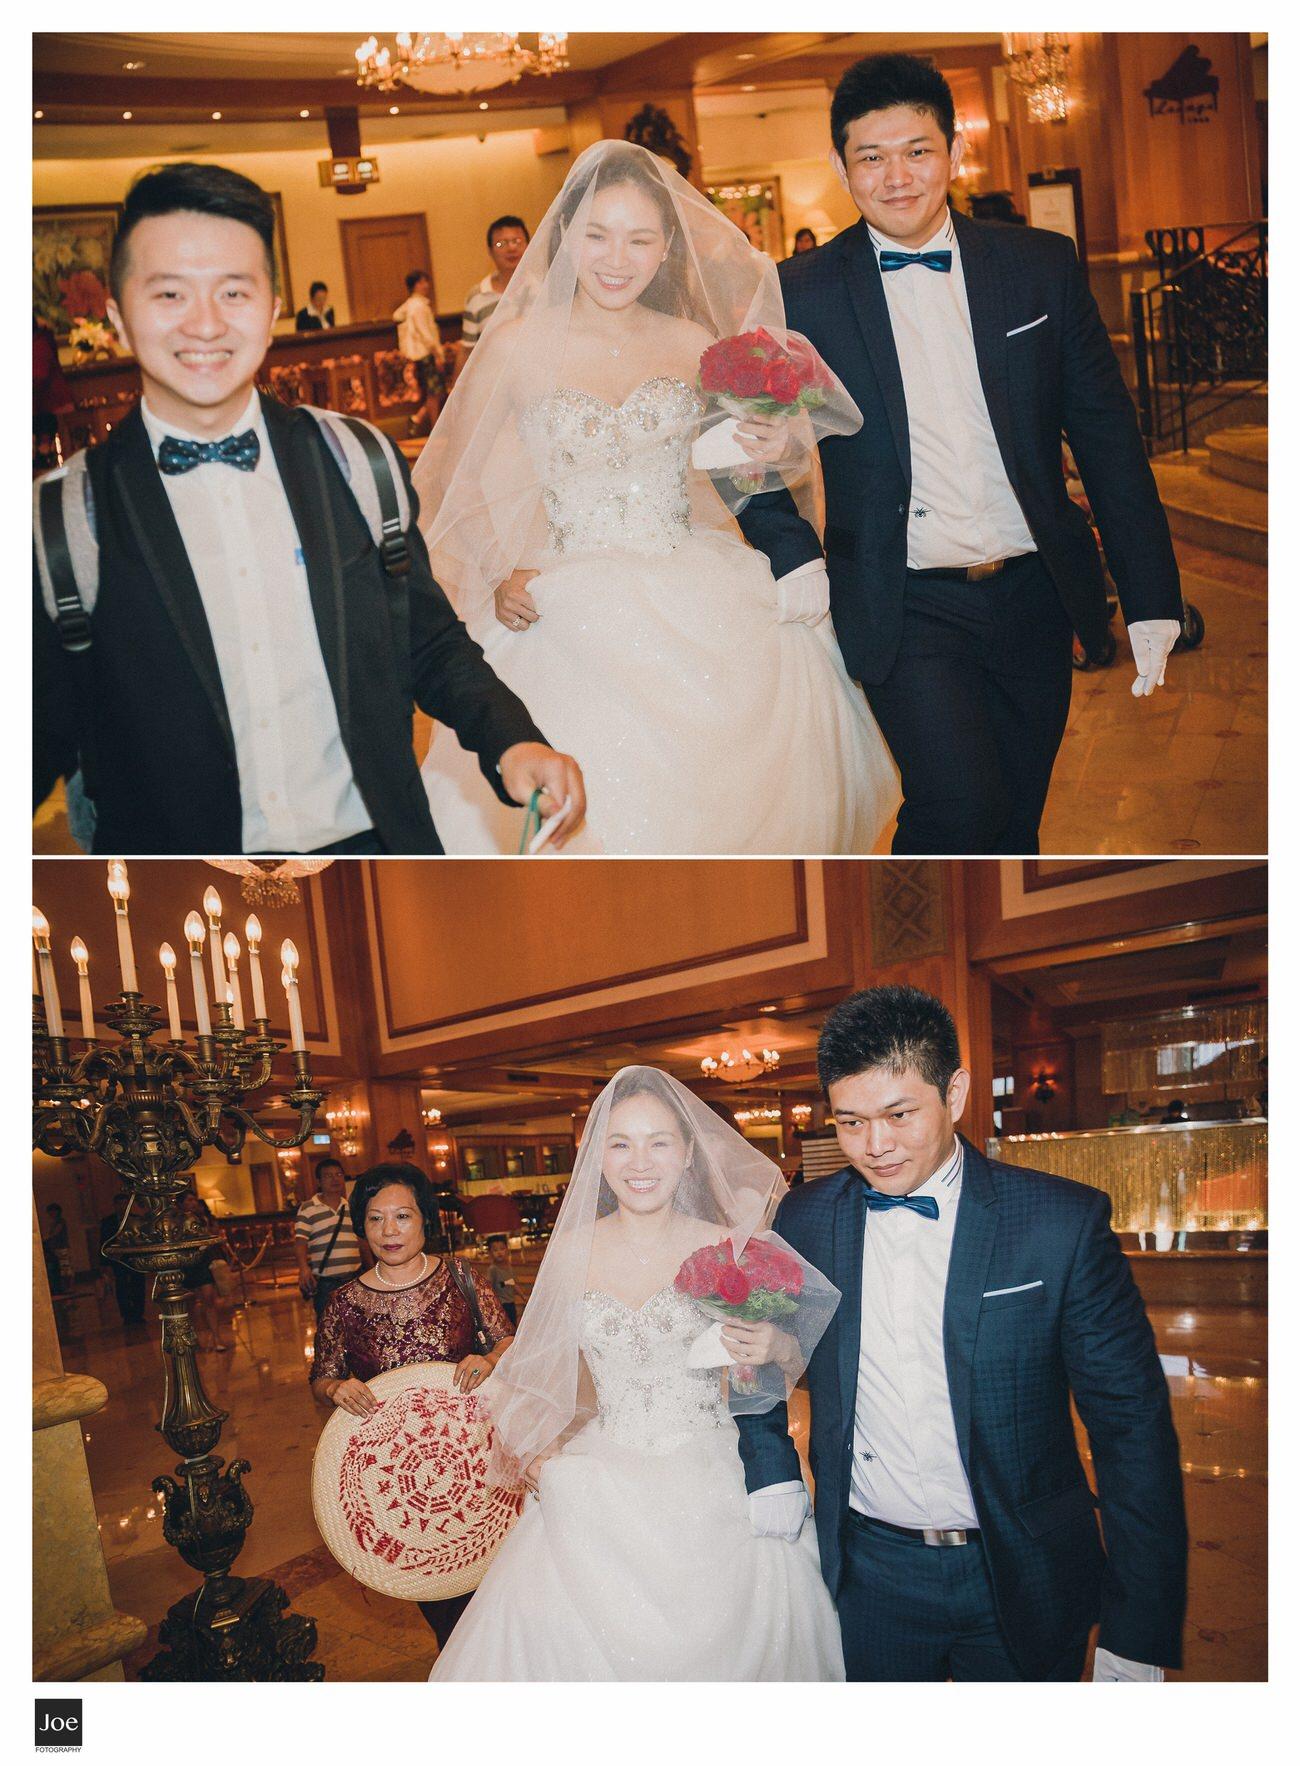 grand-hilai-hotel-wedding-daniel-yvette-joe-fotography-069.jpg